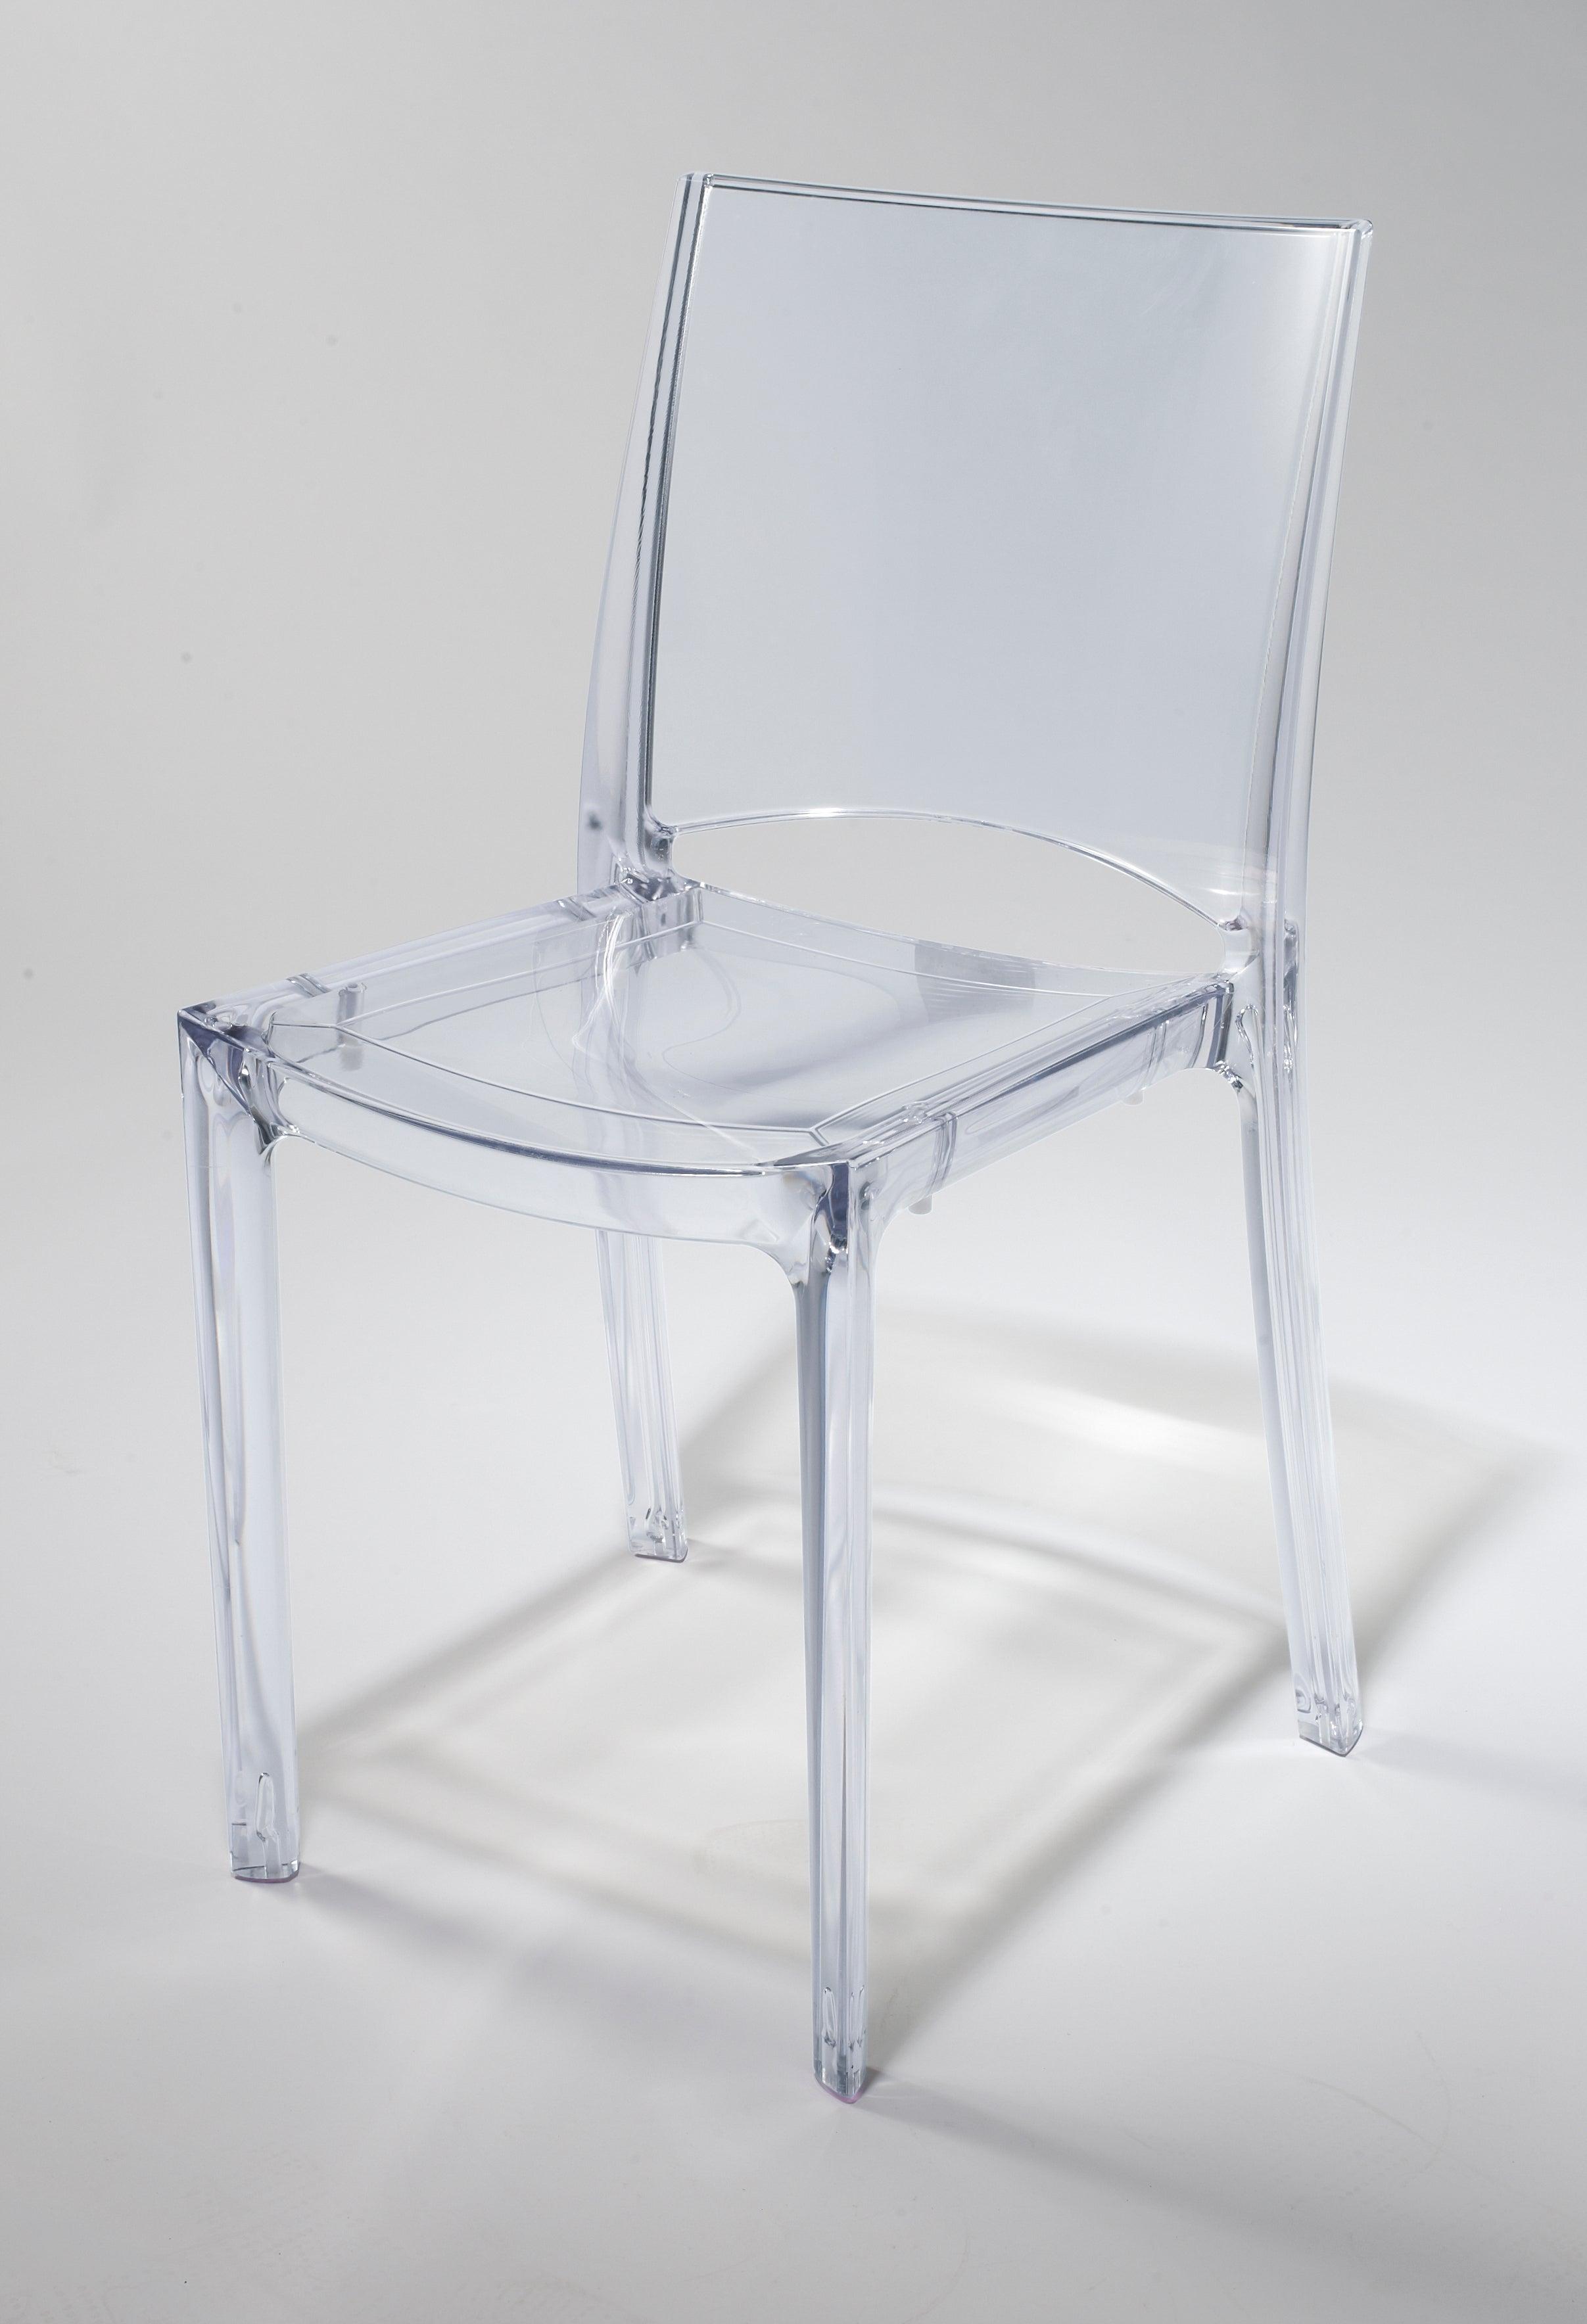 Chaise transparente Leroy Merlin, chaises design polycarbonate